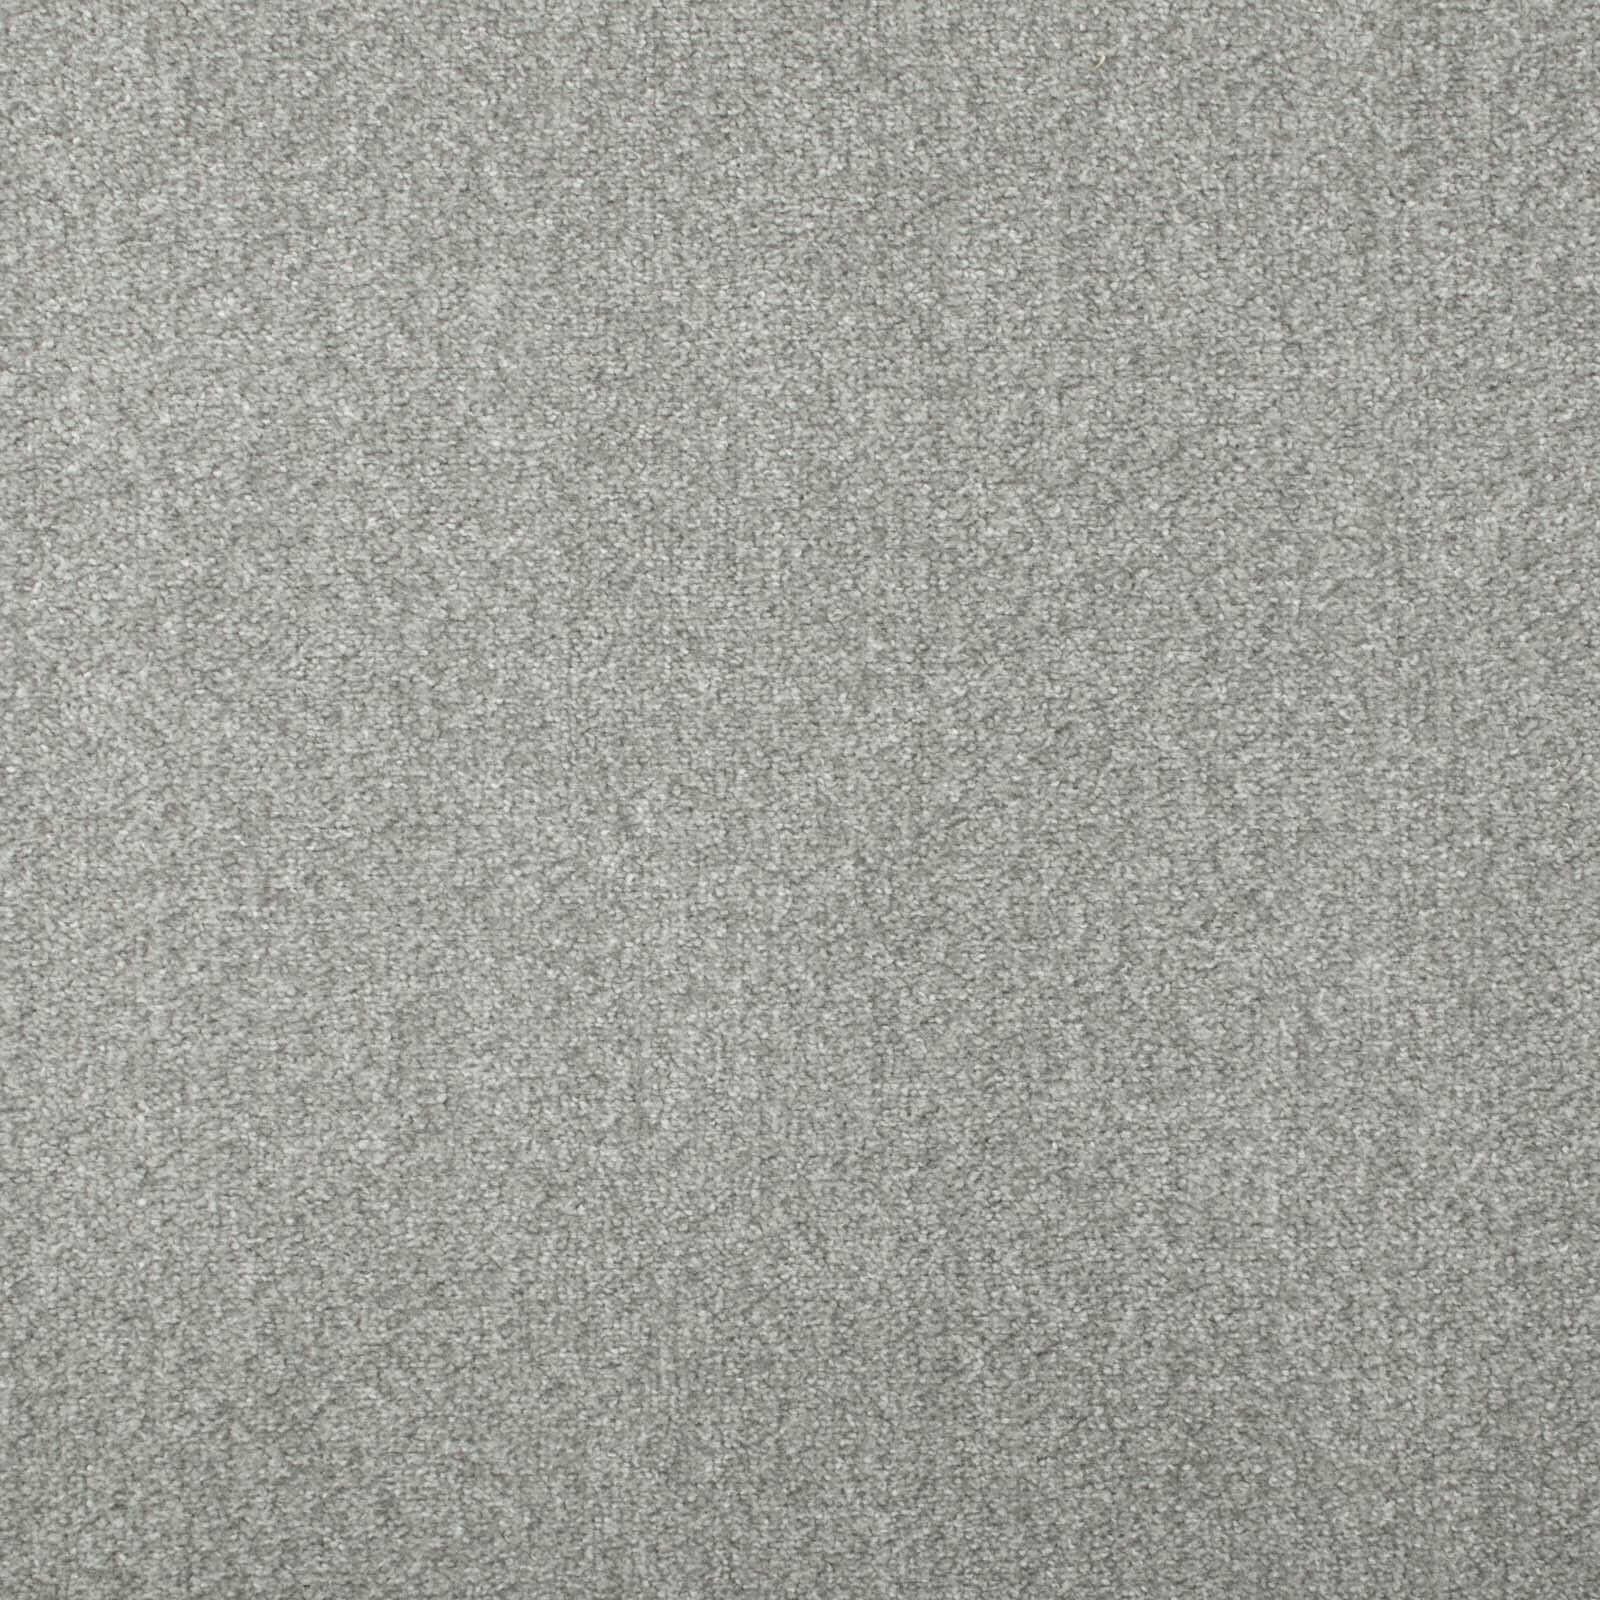 Light Grey Budget Saxony Carpets Feltback Self Adhesive